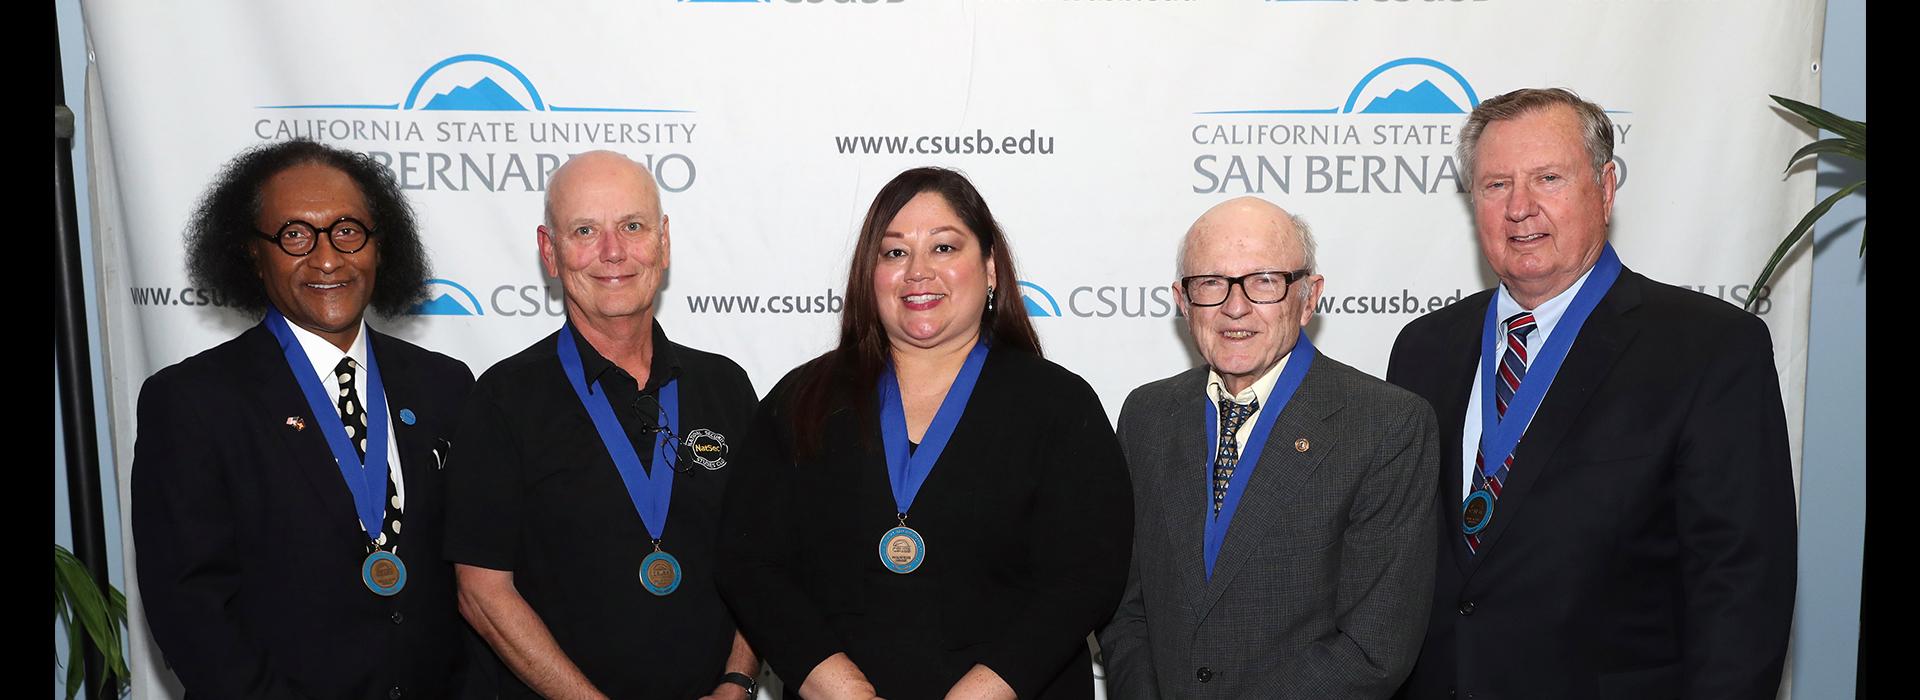 Inside CSUSB — 2018-19 Issue 12